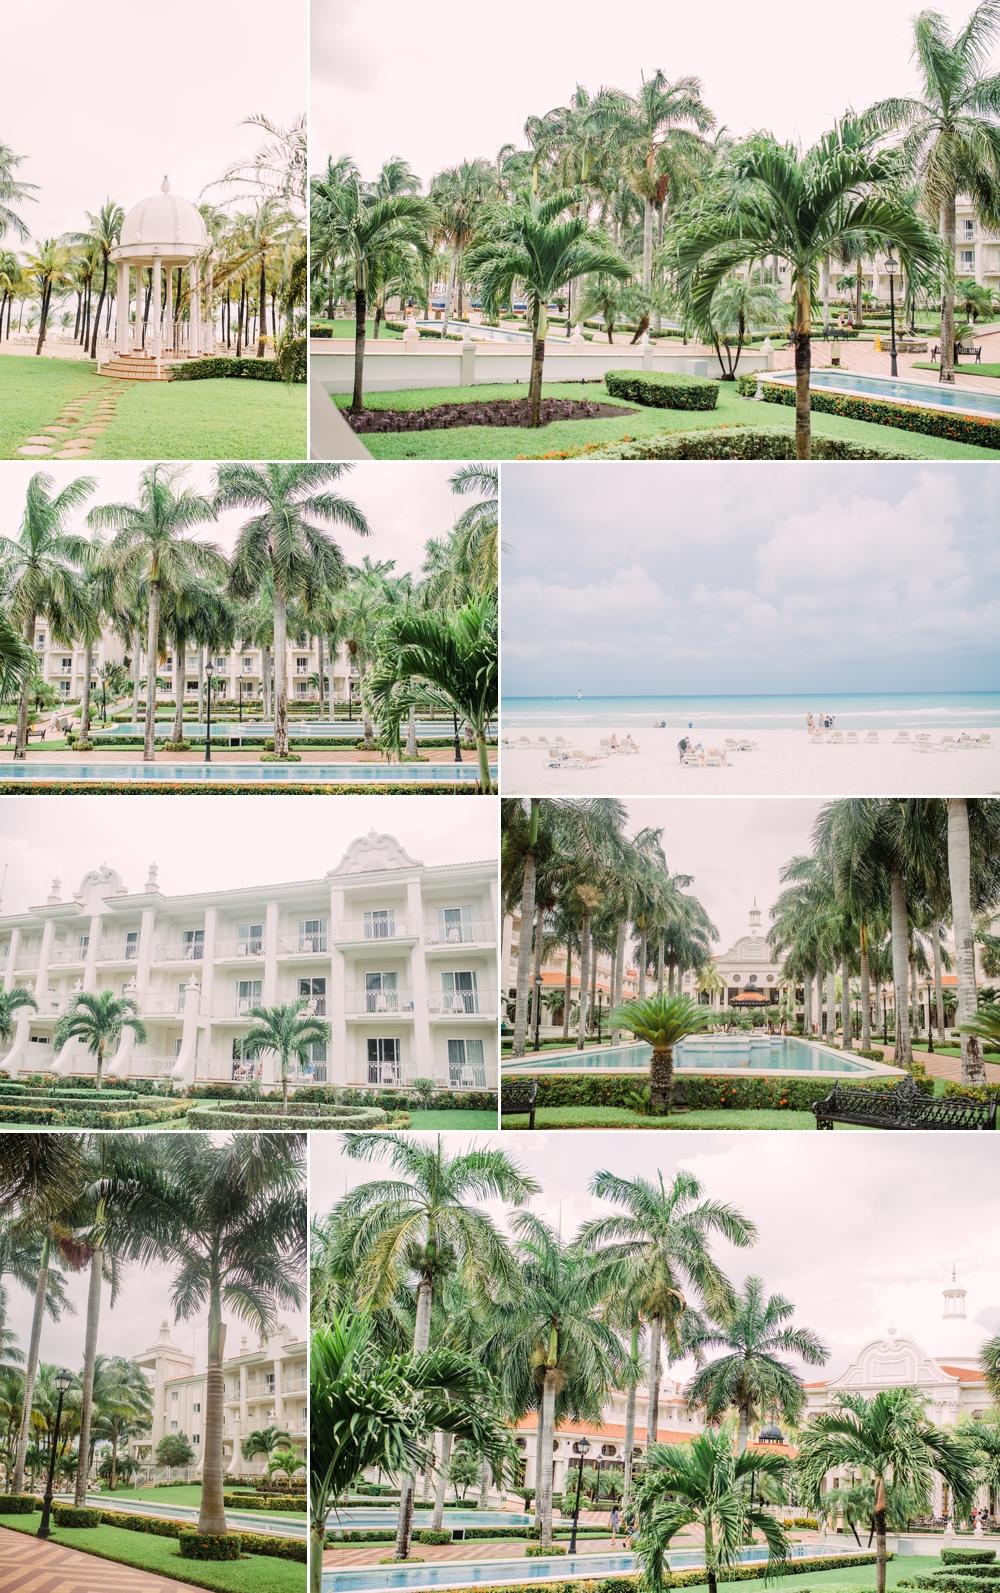 Destination Wedding Photography_Riu Palace Riviera Maya_Playa Del Carmen_Mexico_Shots of Resort_Destination Wedding Photographer.jpg